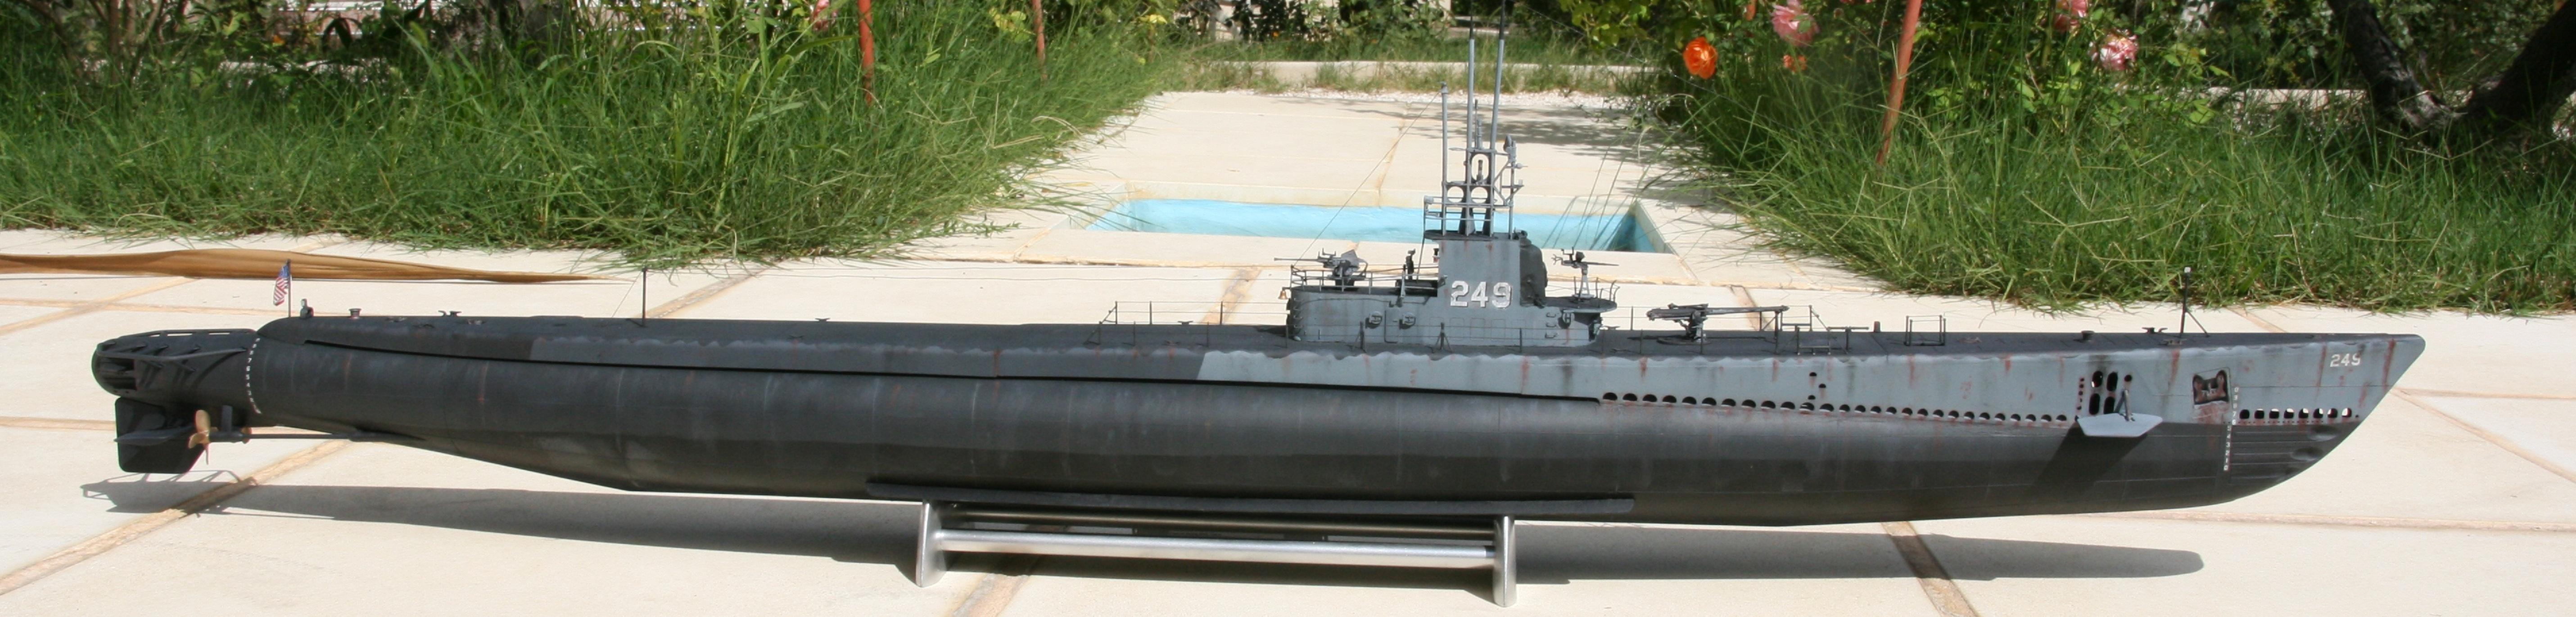 USS FLASHER, Classe Gato, 1/72° 764237IMG7850